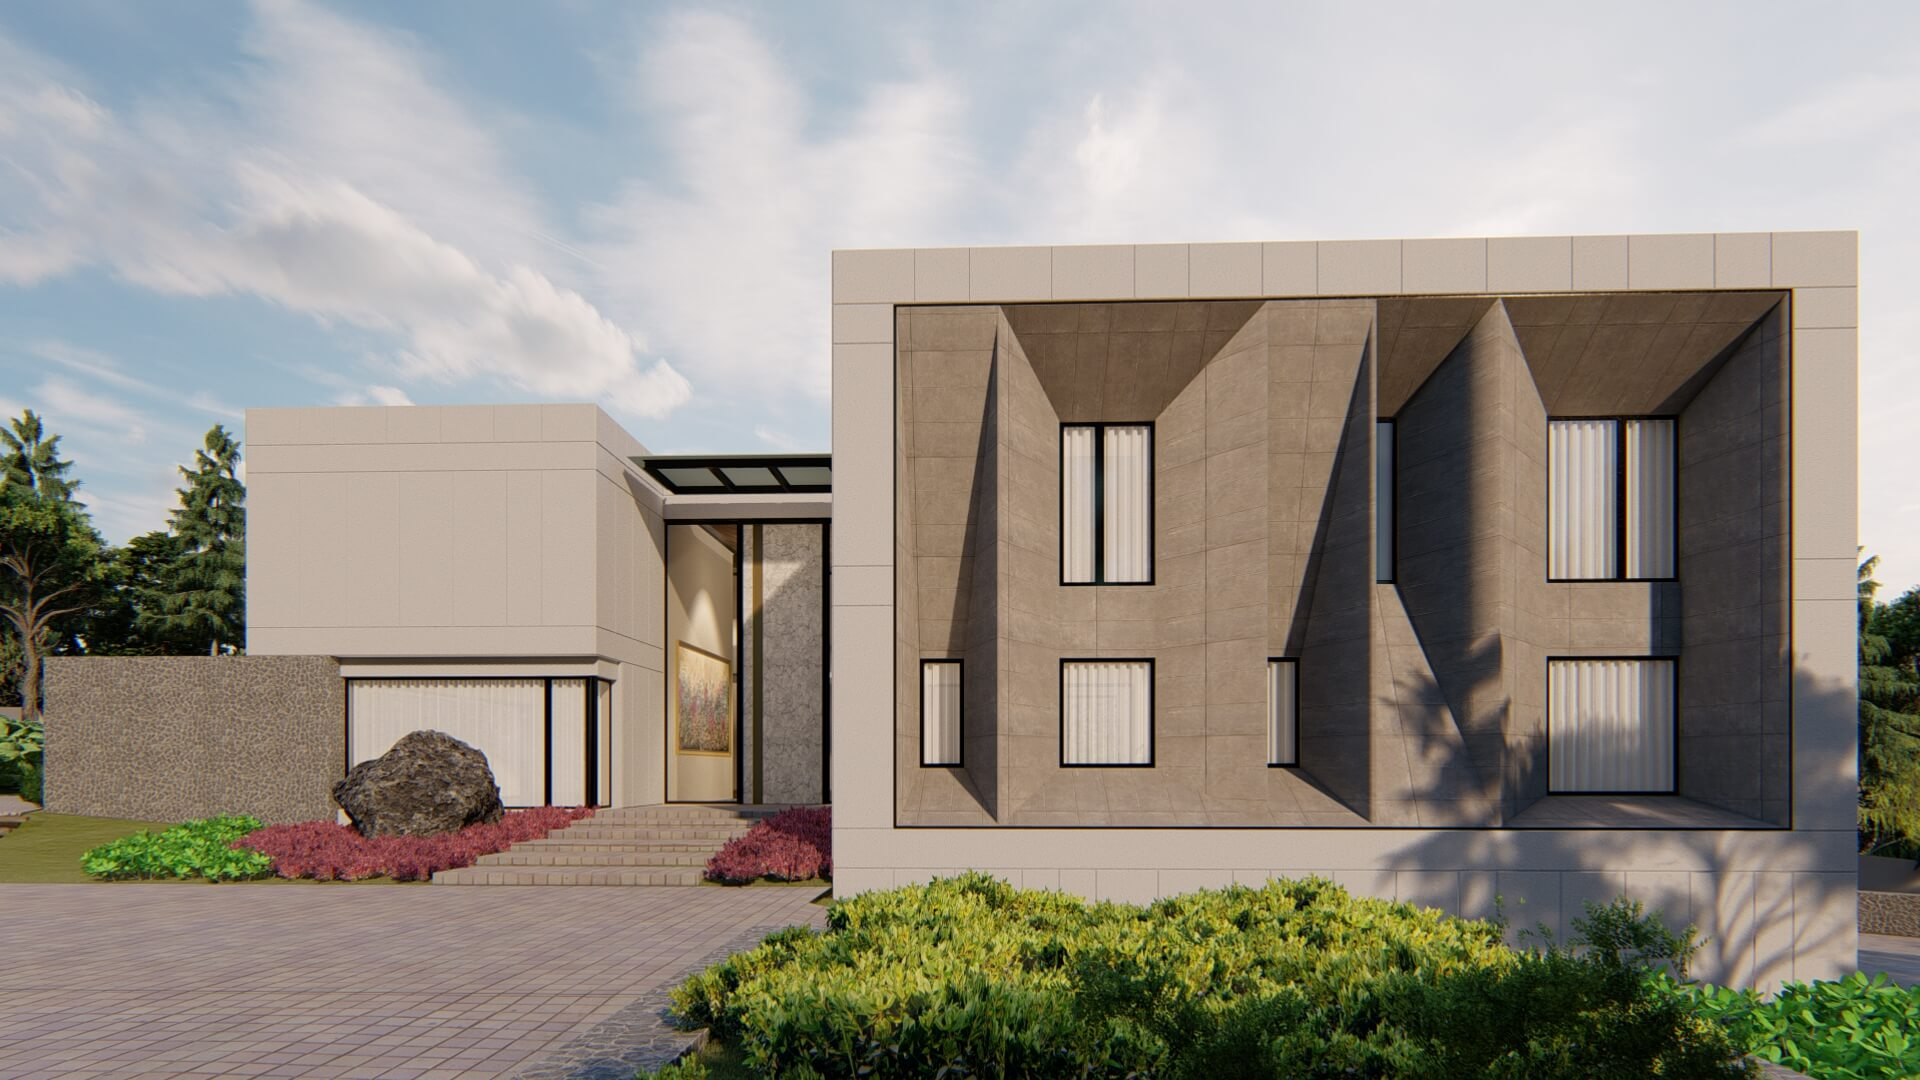 diseño de casas modernas hecho por constructora con experiencia